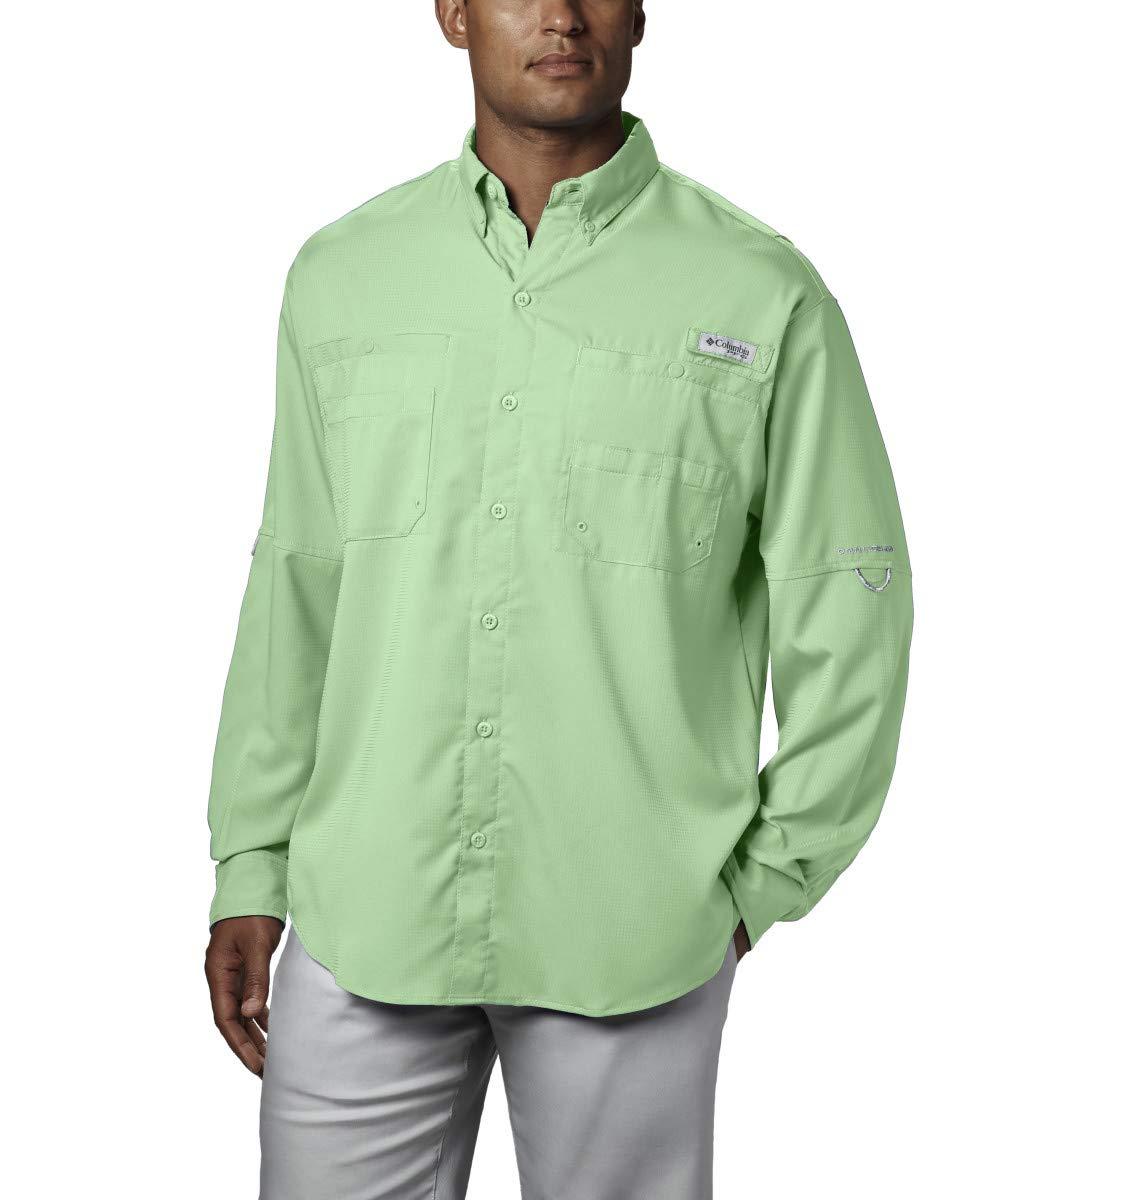 Columbia Men's PFG Tamiami II Long Sleeve Shirt - Big , Key West, X-Small